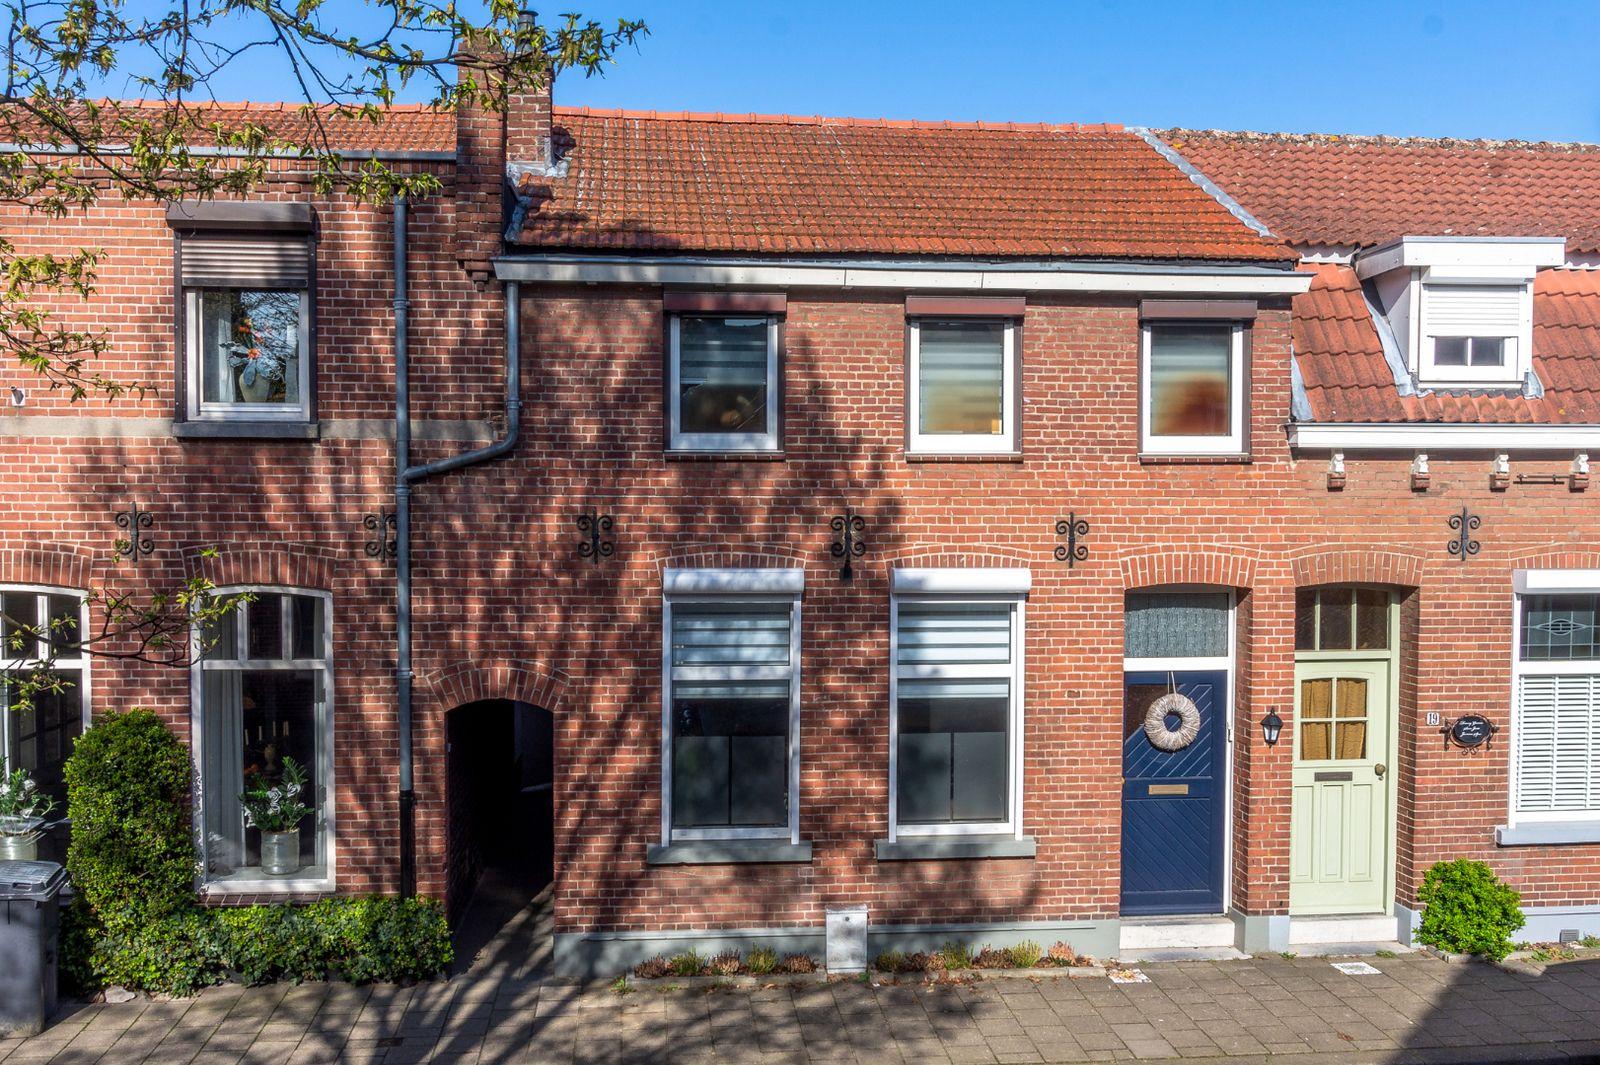 2e Graaf van Loonstraat 17, Venlo